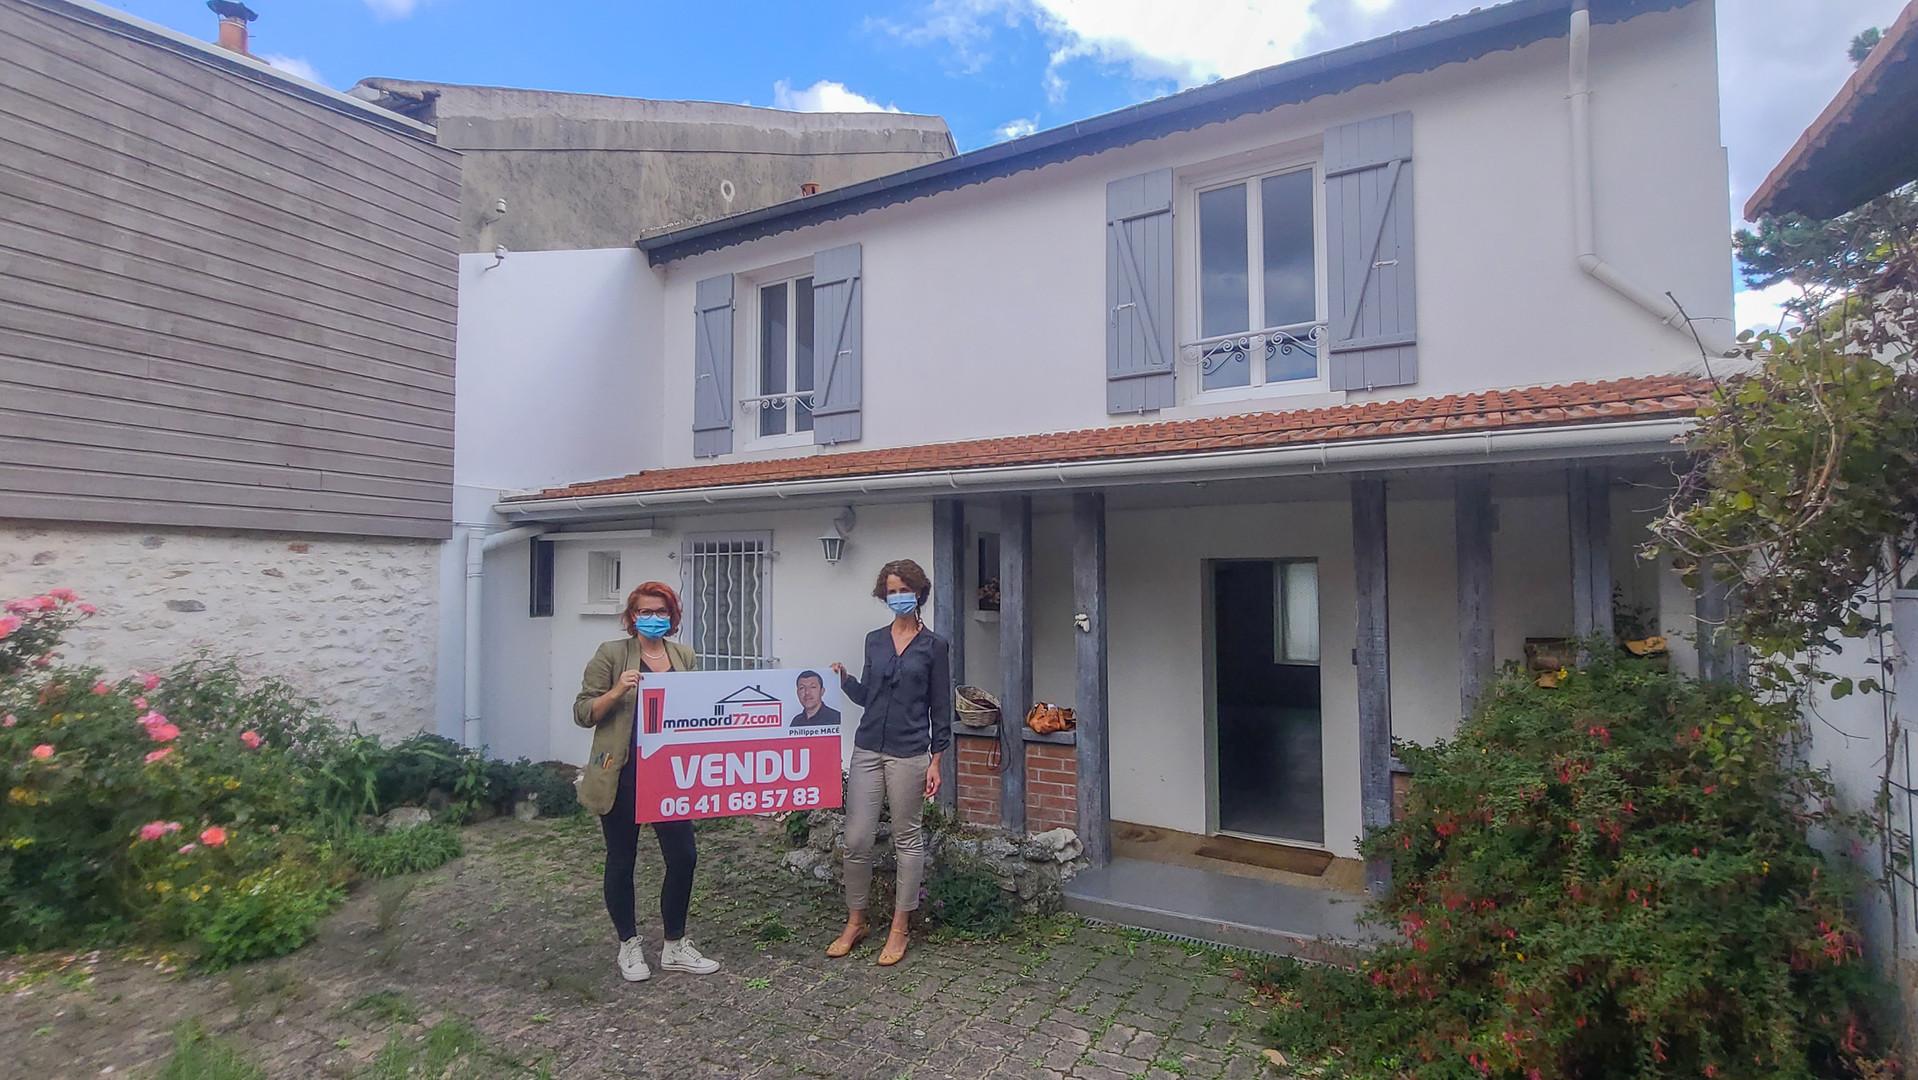 Maison-vendu-Vendeuse-Acheteuse-Messy.jp